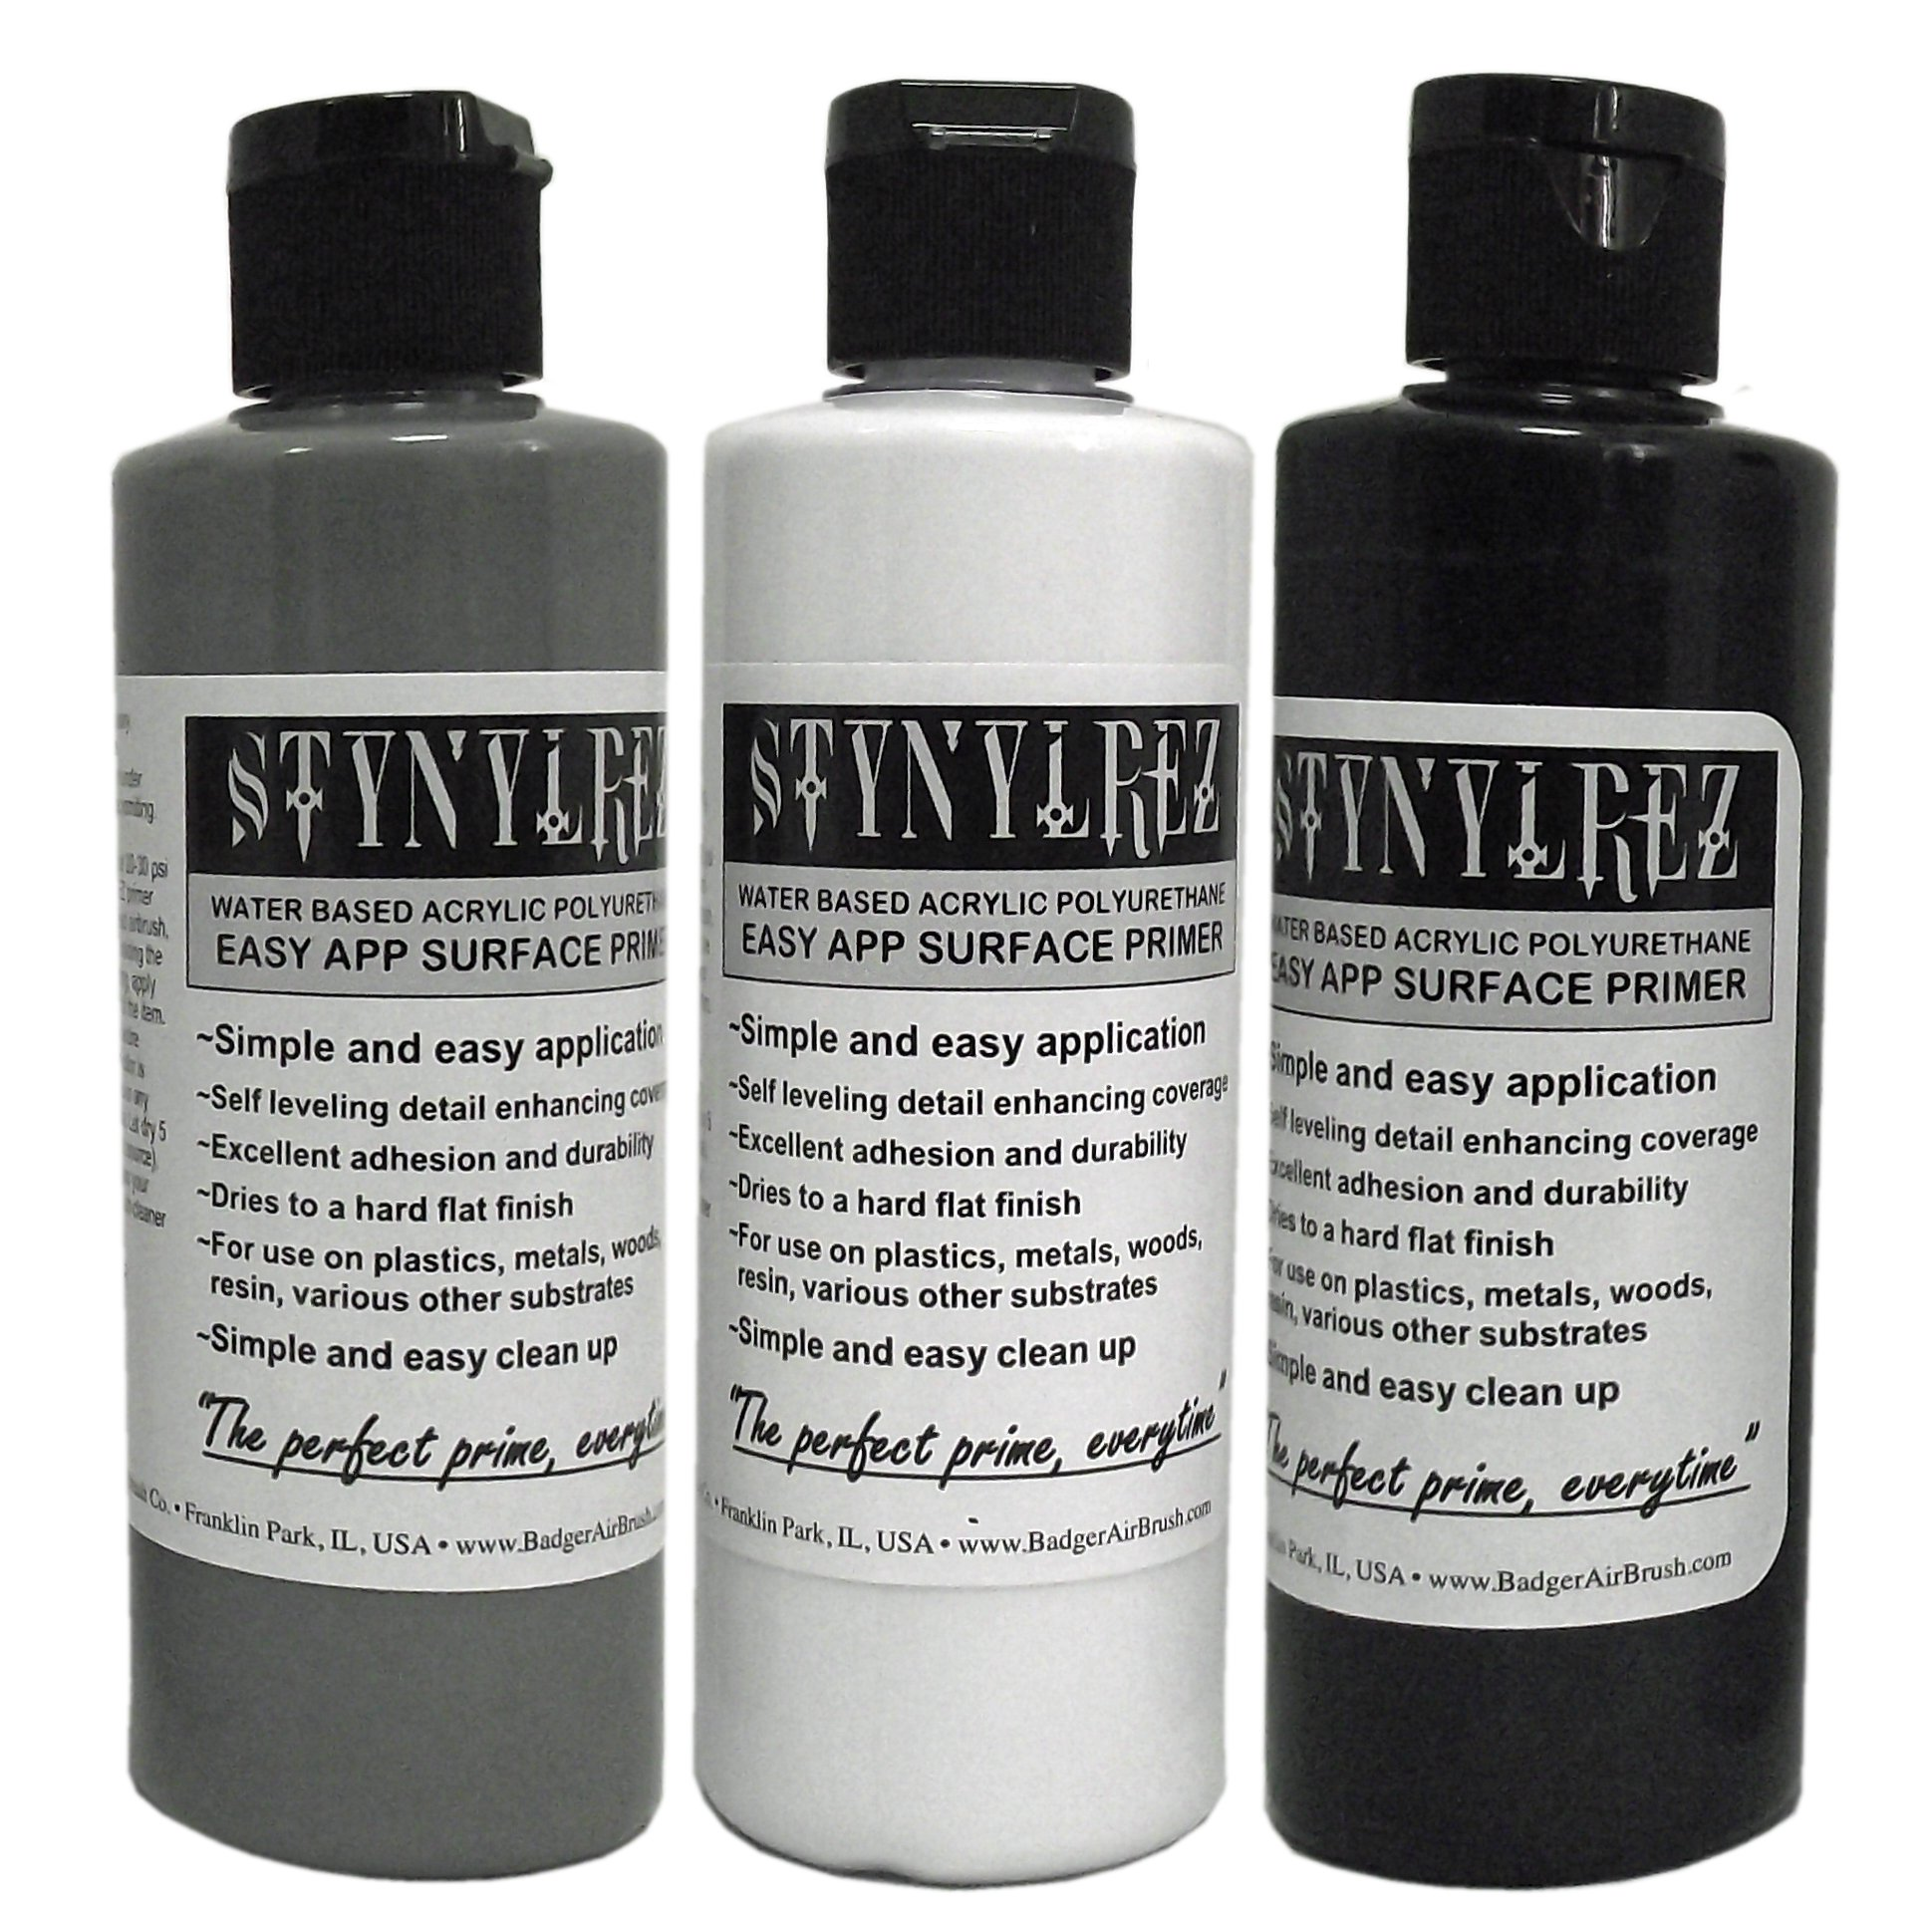 Badger Air-Brush SNR-410 Stynylrez Water Based Acrylic Polyurethane 3-Tone Primer, 4-Ounce, White/Gray/Black,